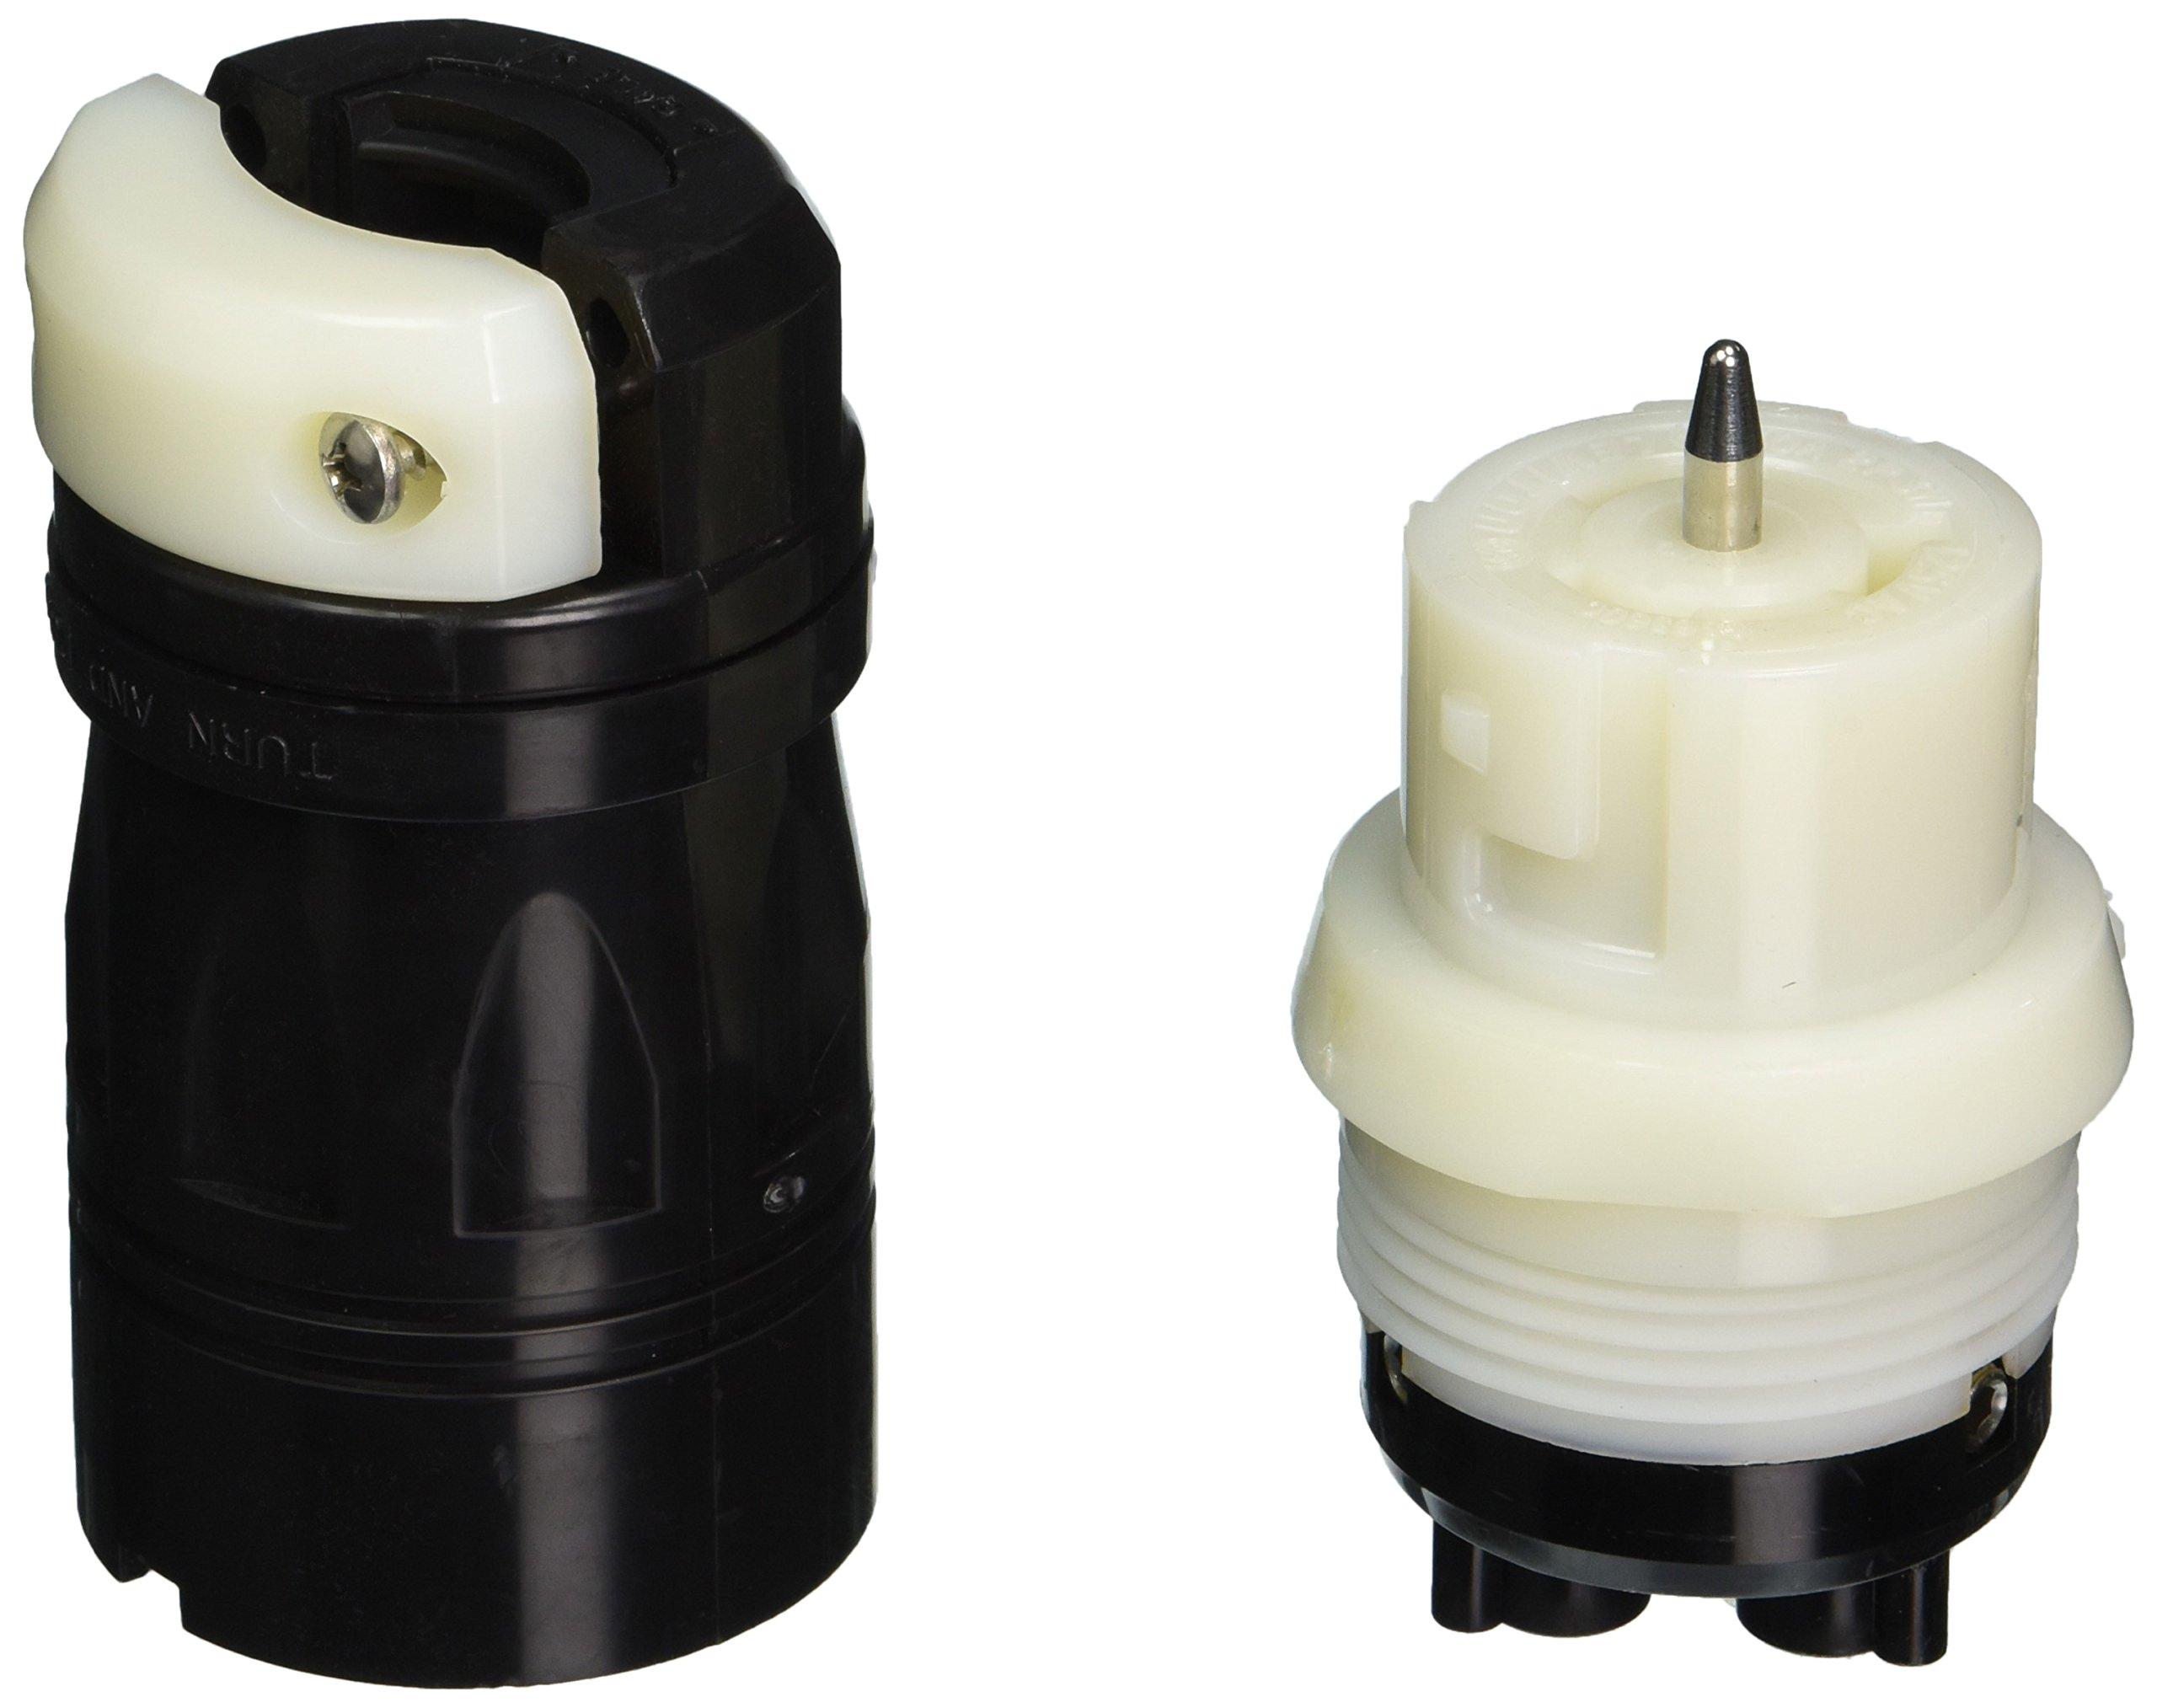 Leviton CS6360C 50-Amp, 125V AC, Non-NEMA, 2P, 3W, Black and White Locking Connector, Industrial Grade, Grounding, California-Style-CS, Black